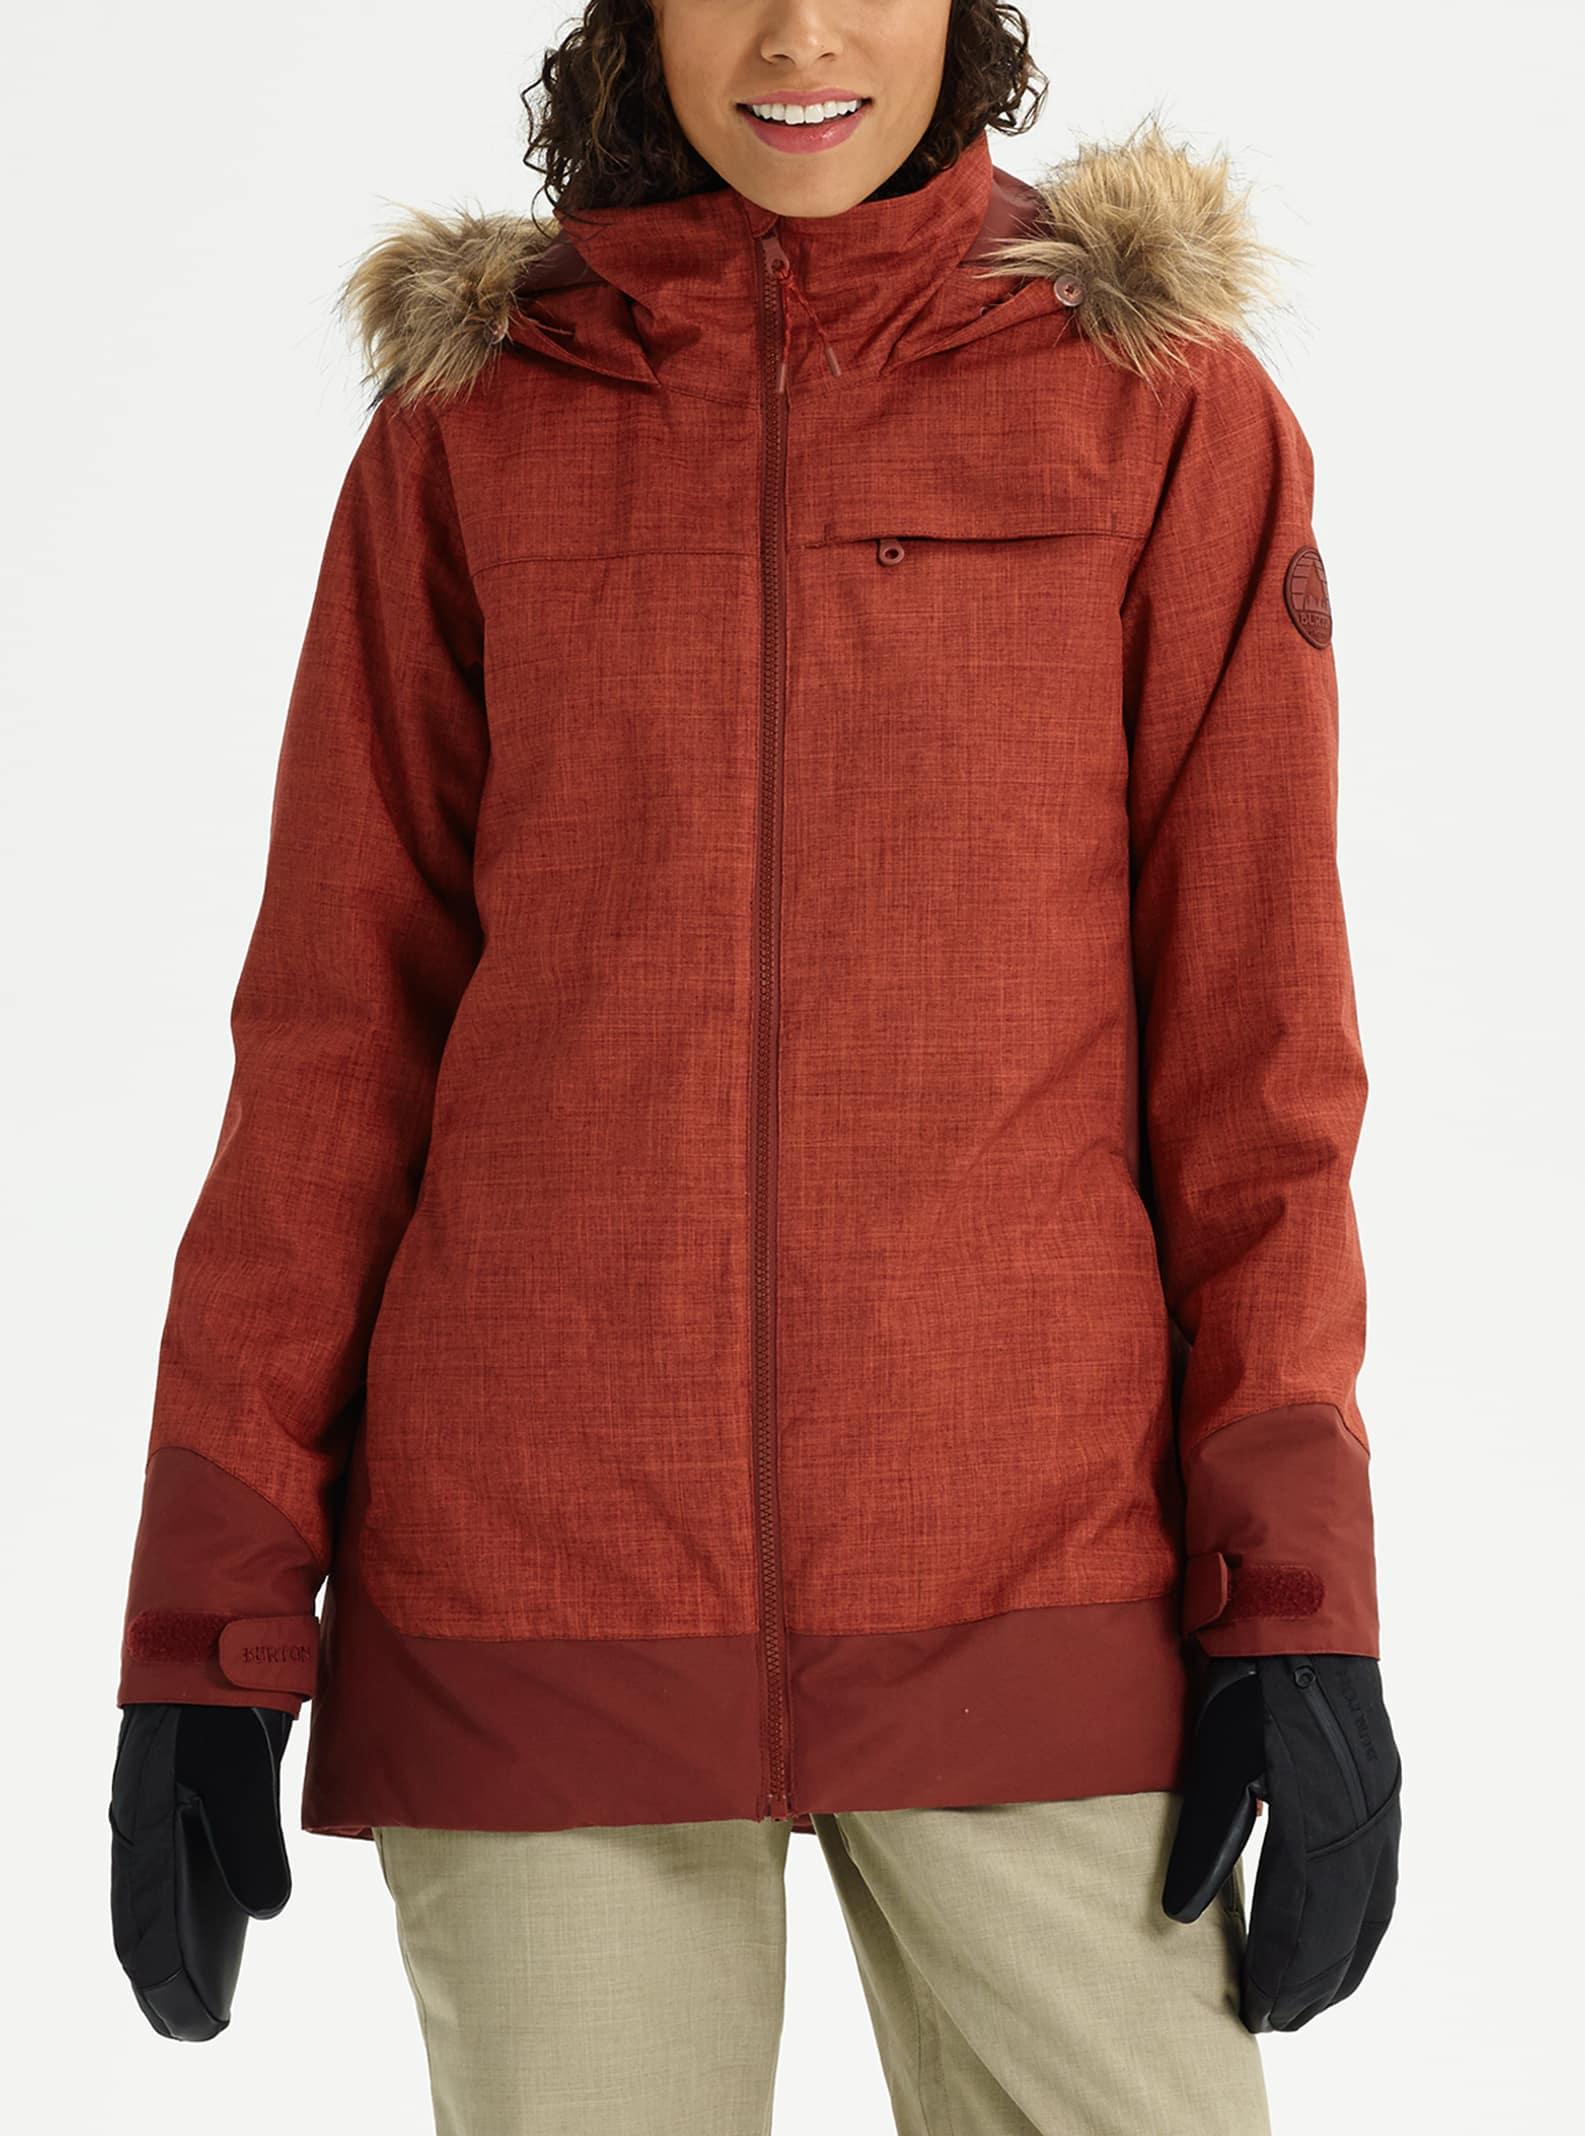 694c12896d4 Women s Snowboard Jackets